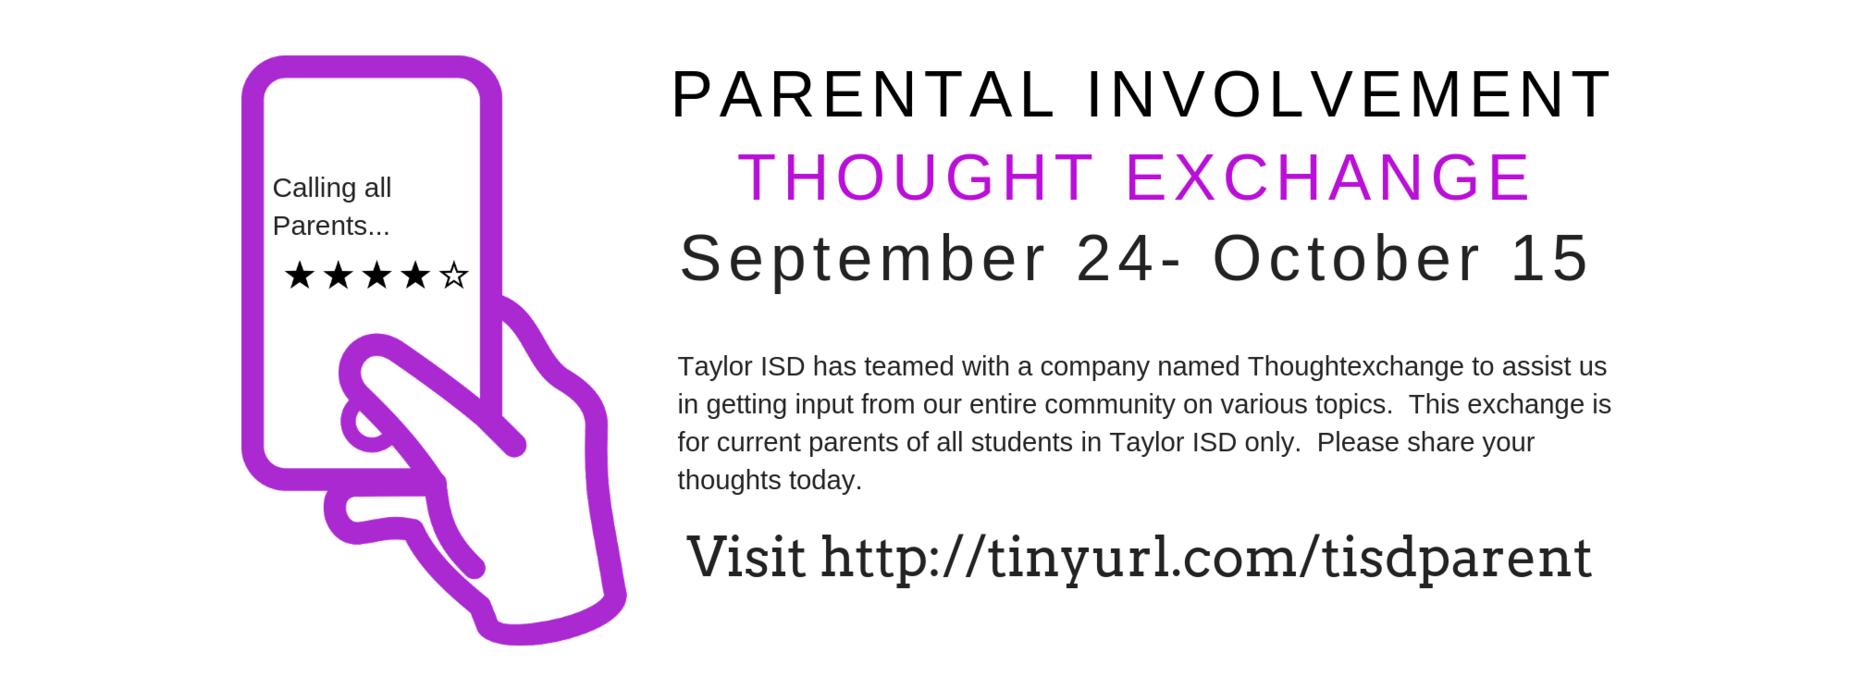 parental involvement thought exchange